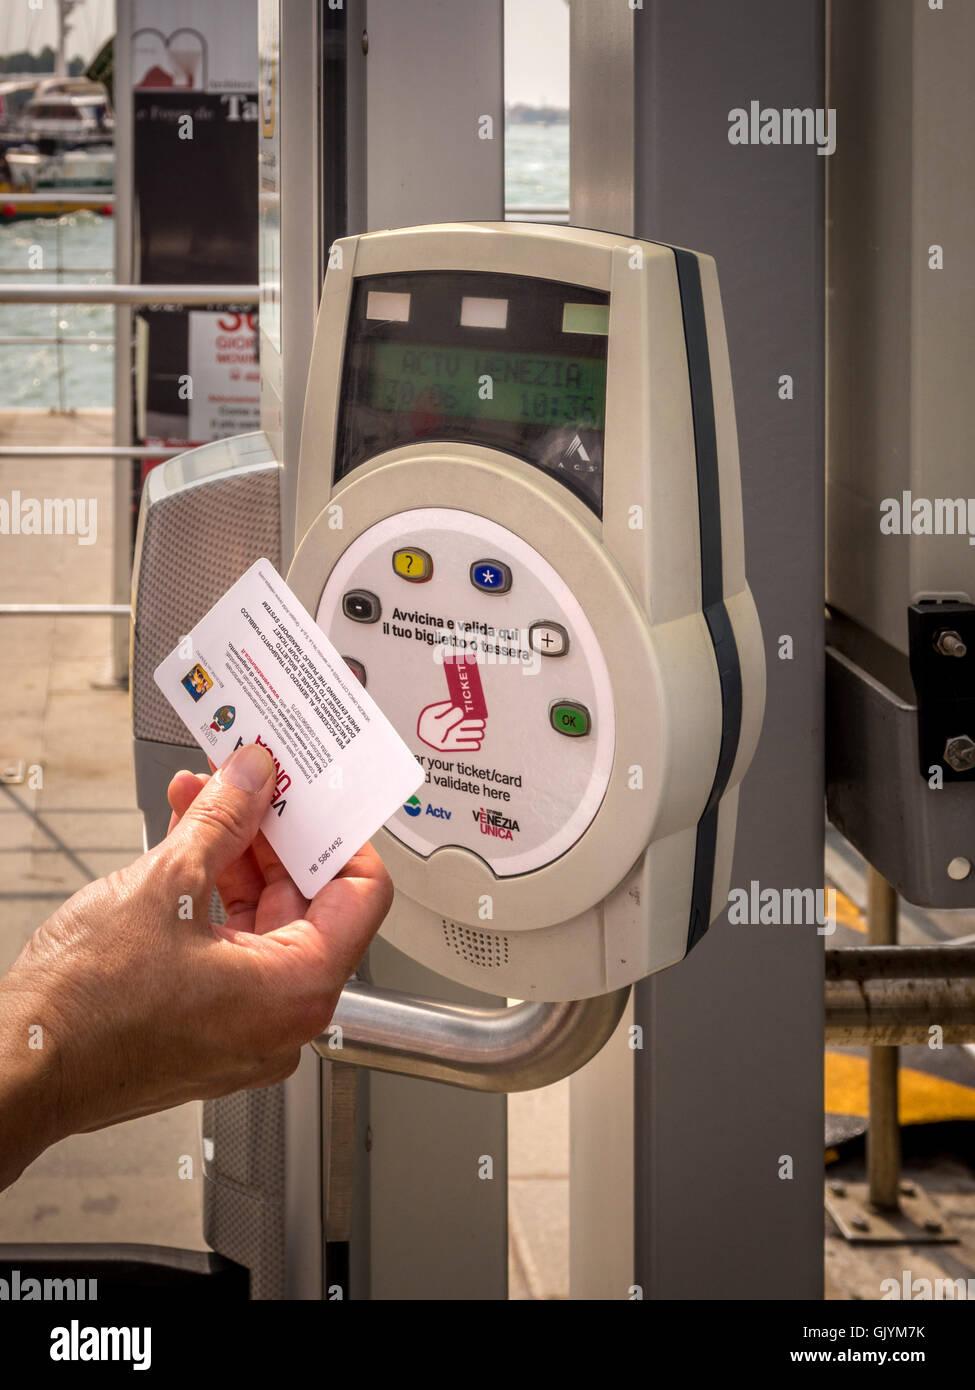 Vaporetto ticket validating terminal, Venice, Italy. - Stock Image